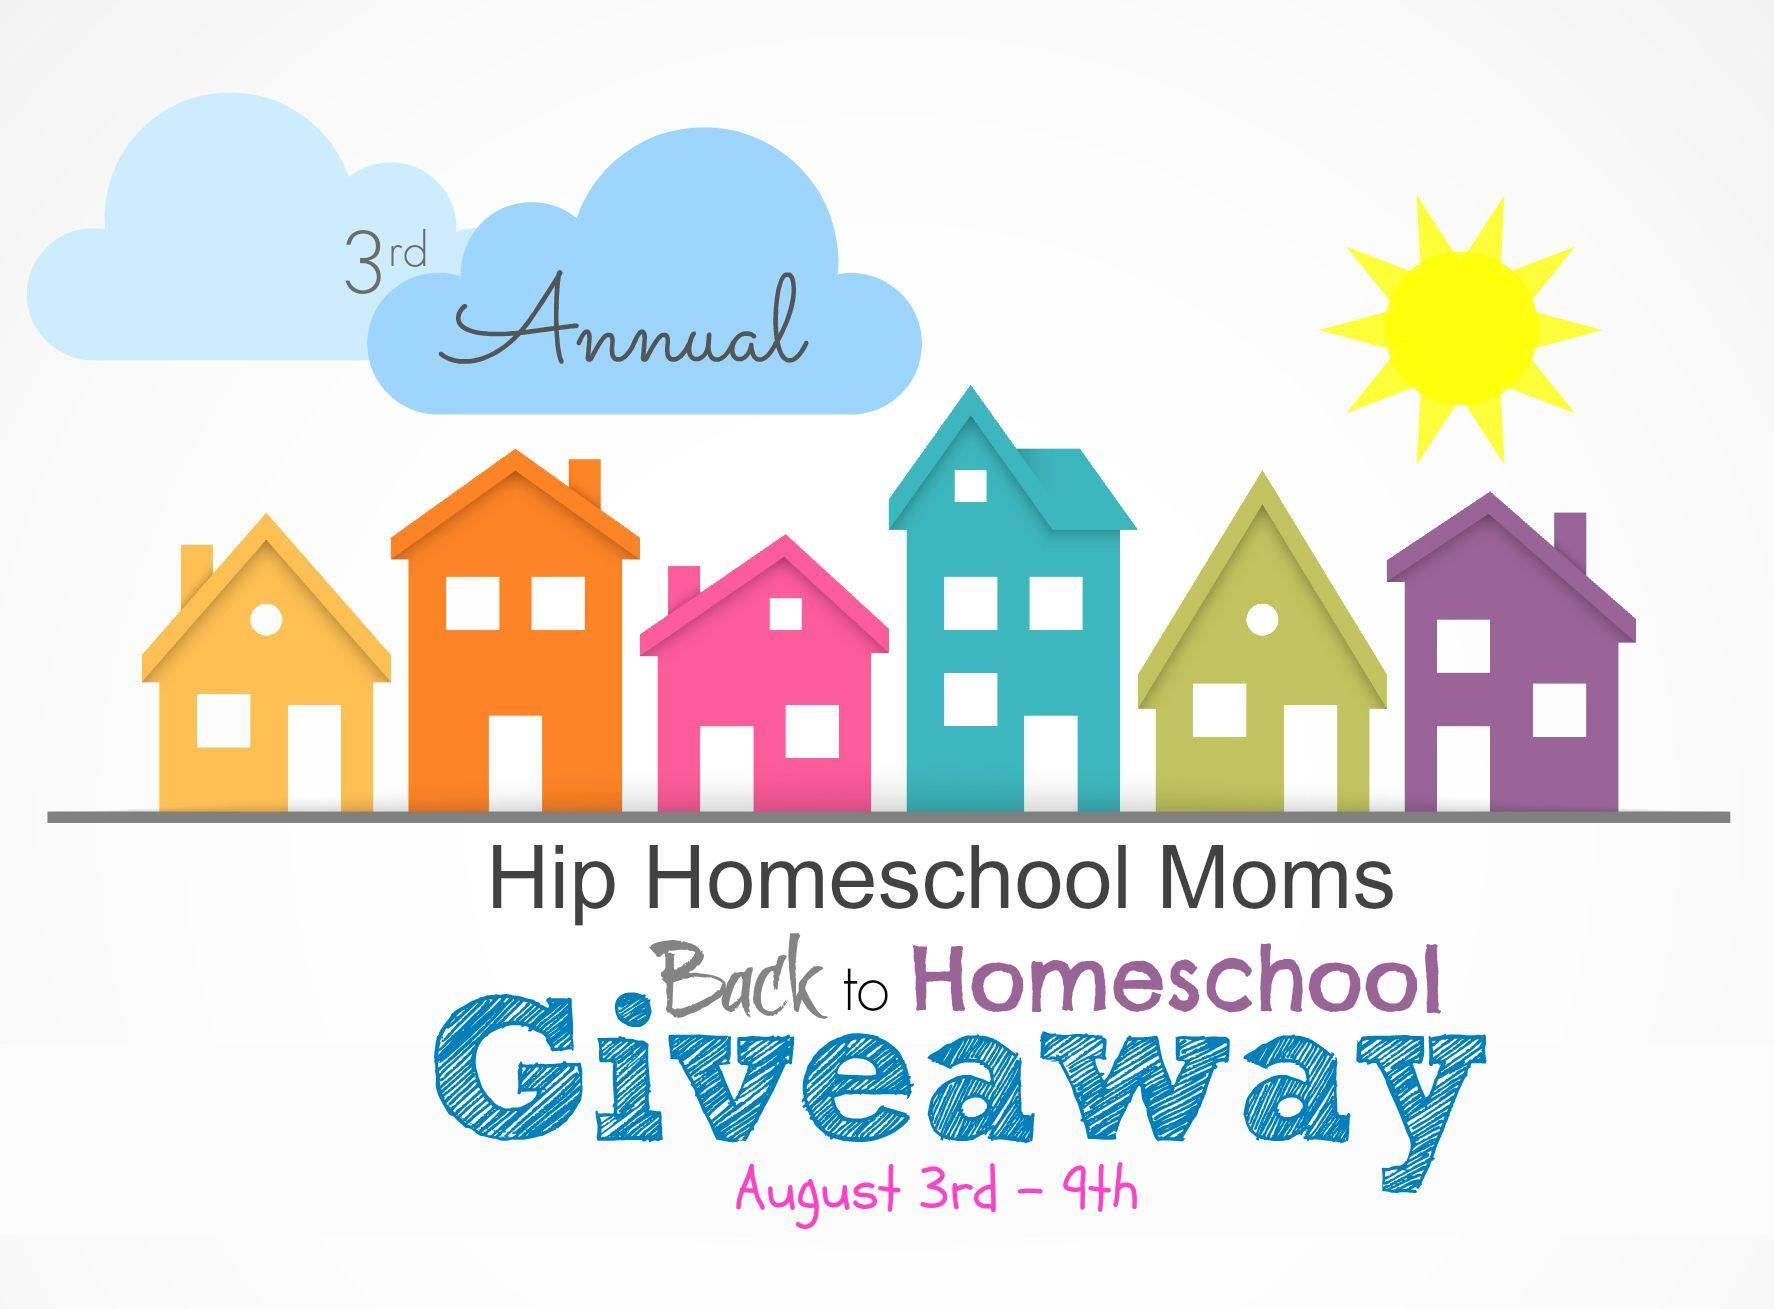 3rd Annual Hip Homeschool Moms Back to Homeschool Giveaway!